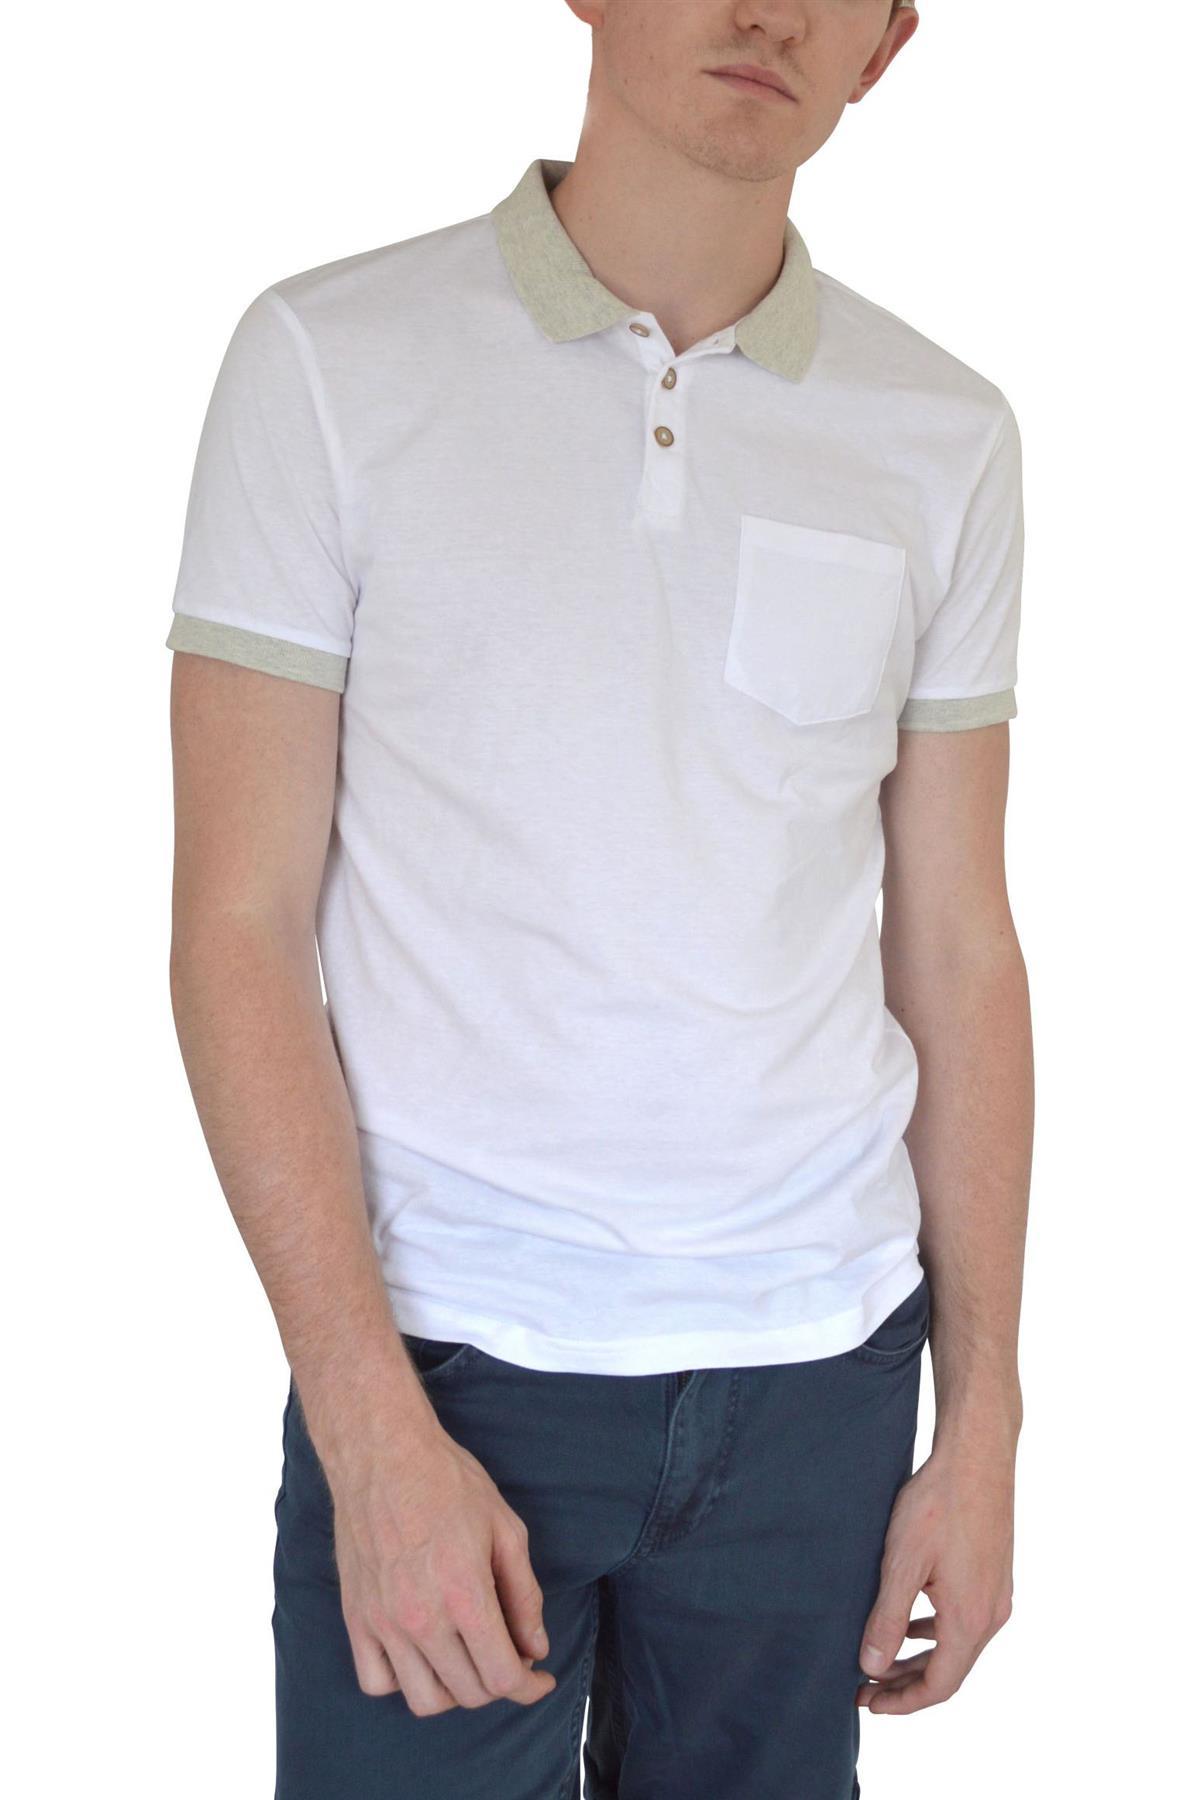 Ex-Mens-H-amp-M-Cotton-Polo-Shirt-Contrast-Collar-Size-S-XXL thumbnail 12